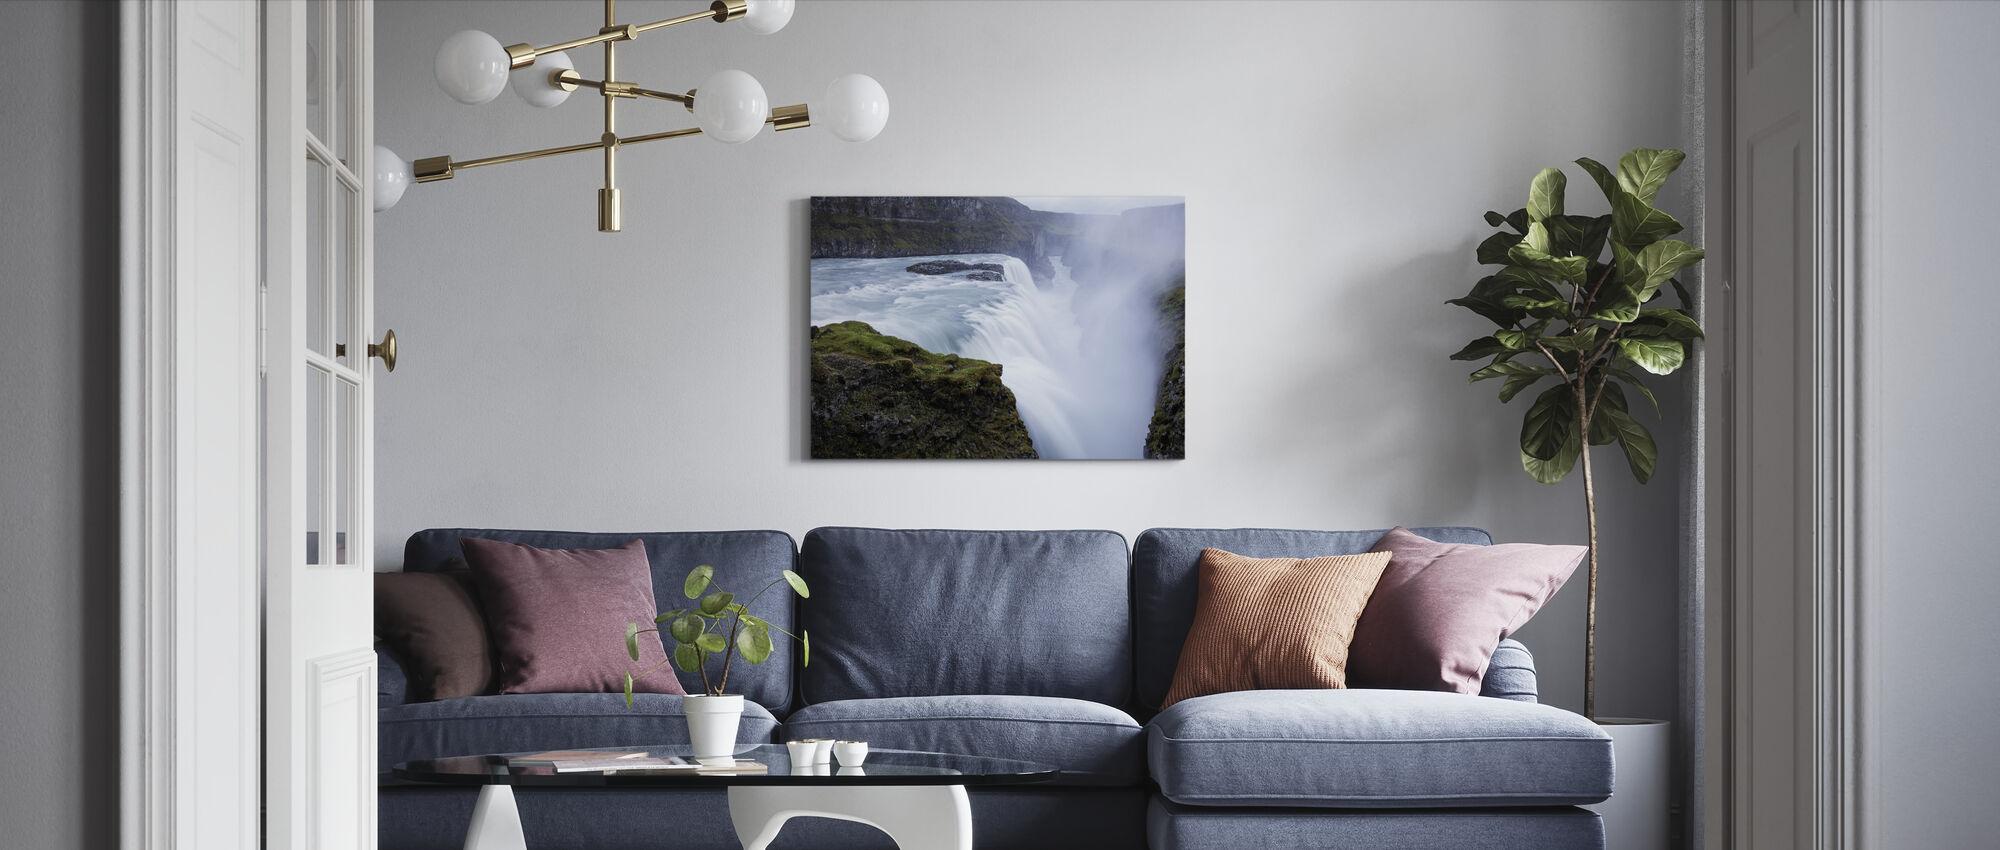 Gullfoss Waterfall, Iceland - Canvas print - Living Room